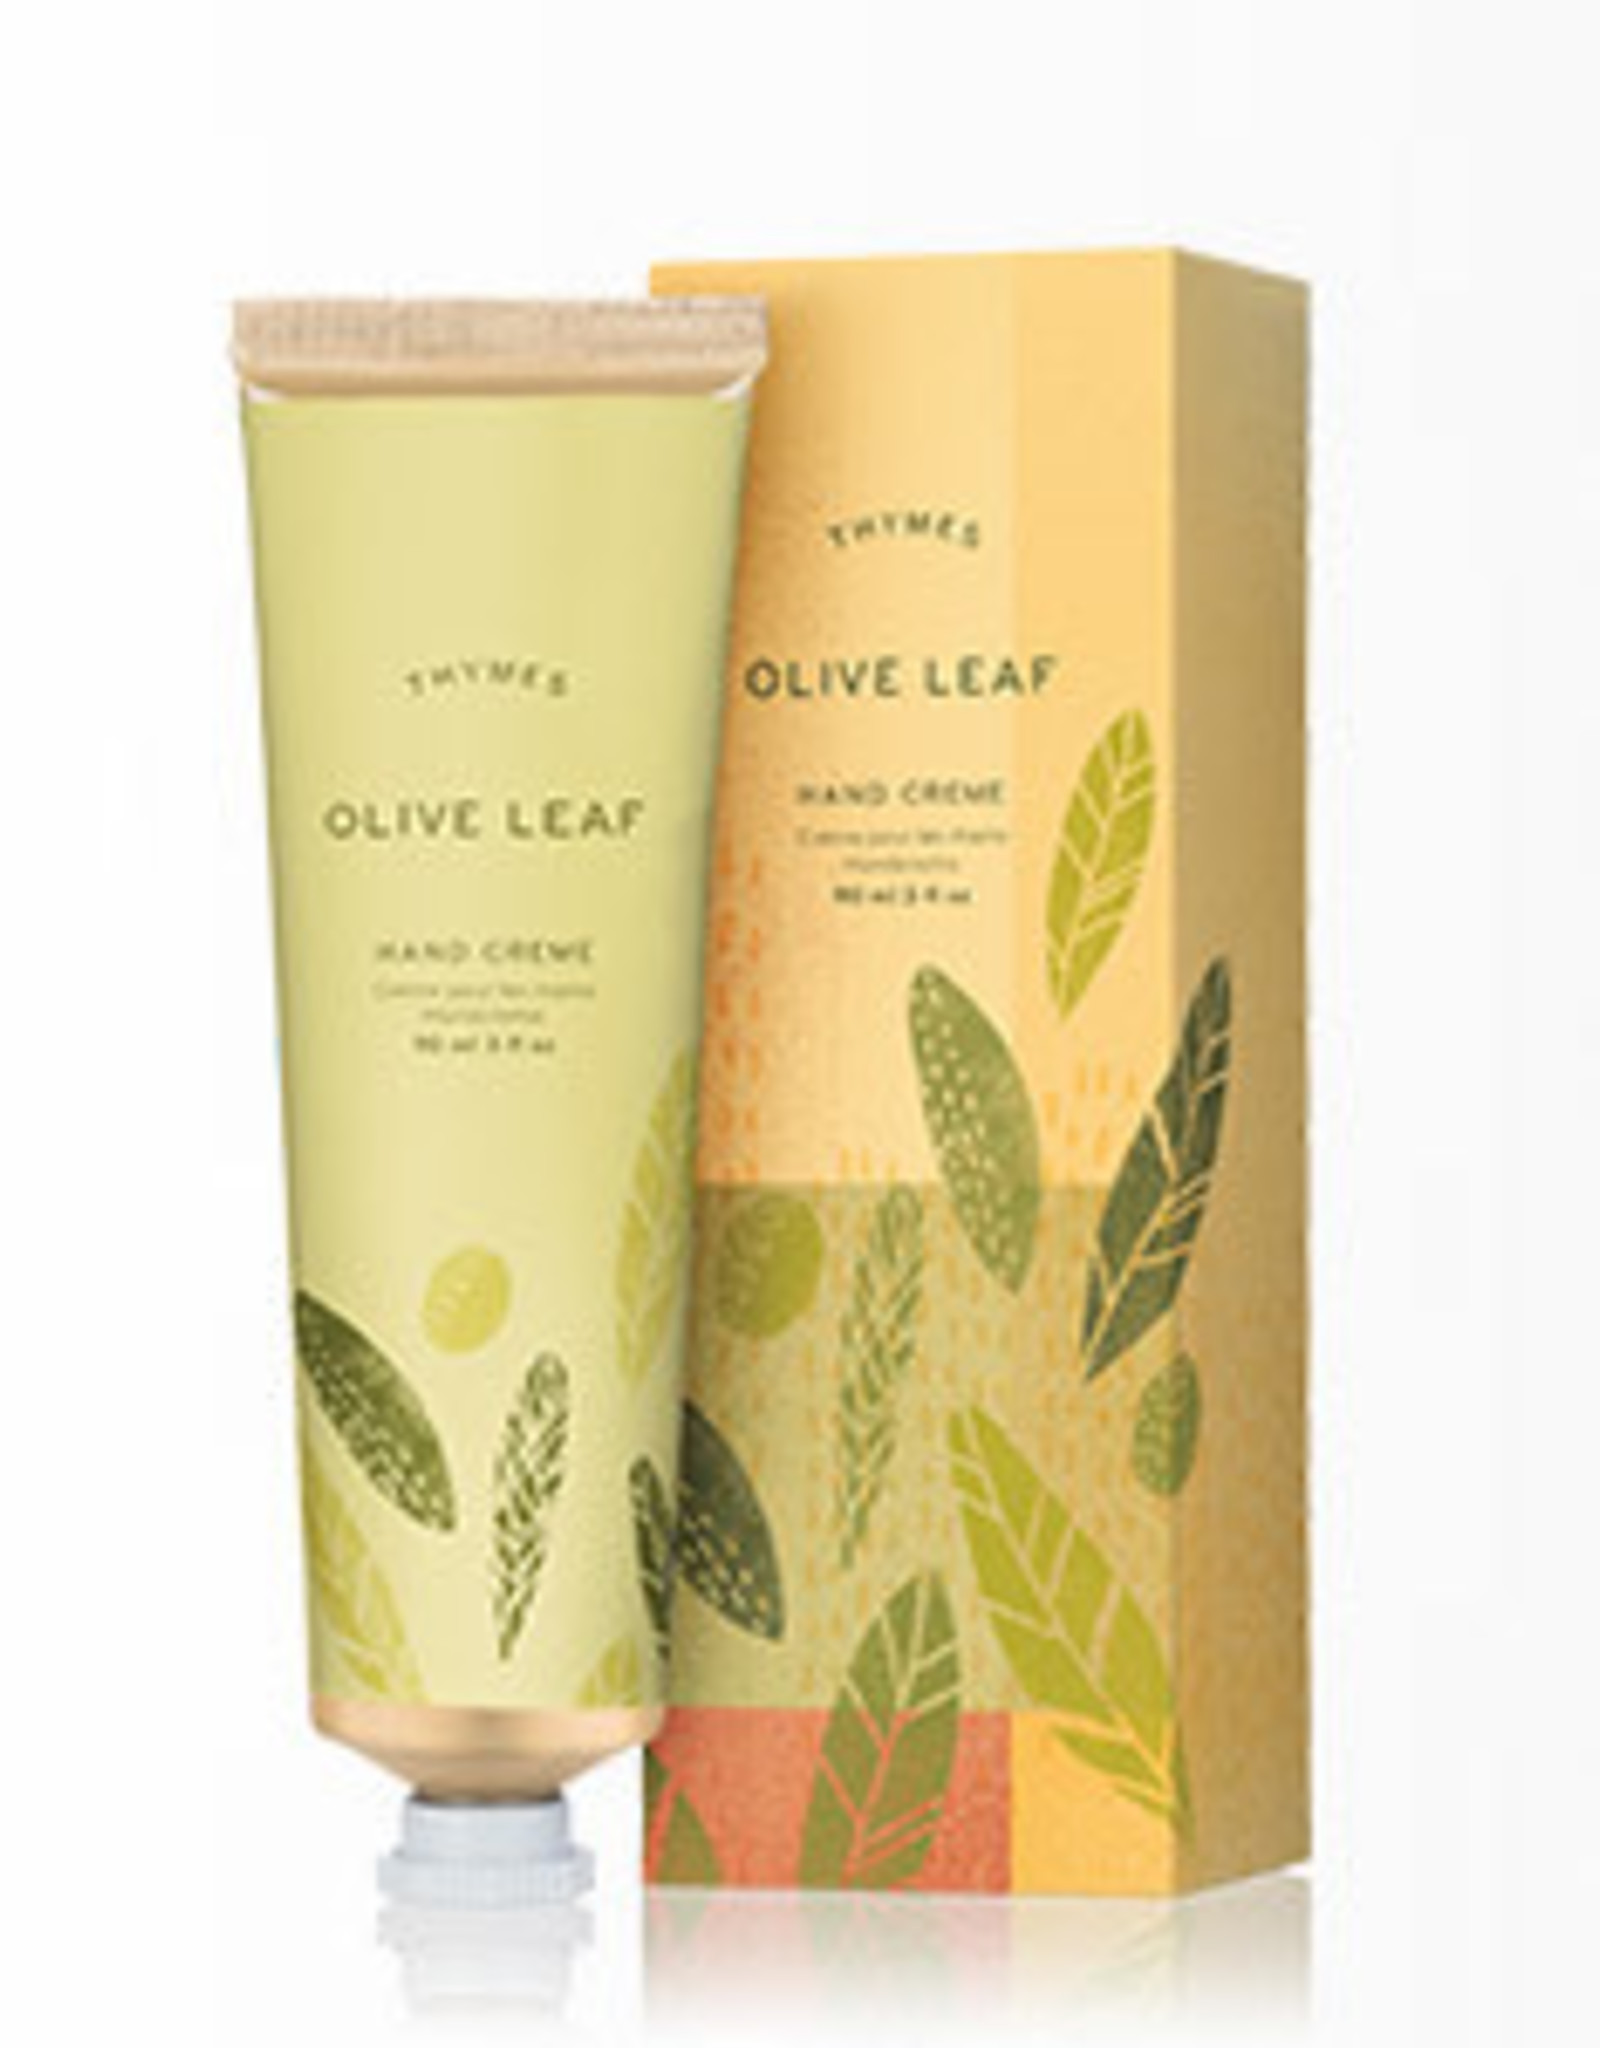 Olive Leaf Hand Cream